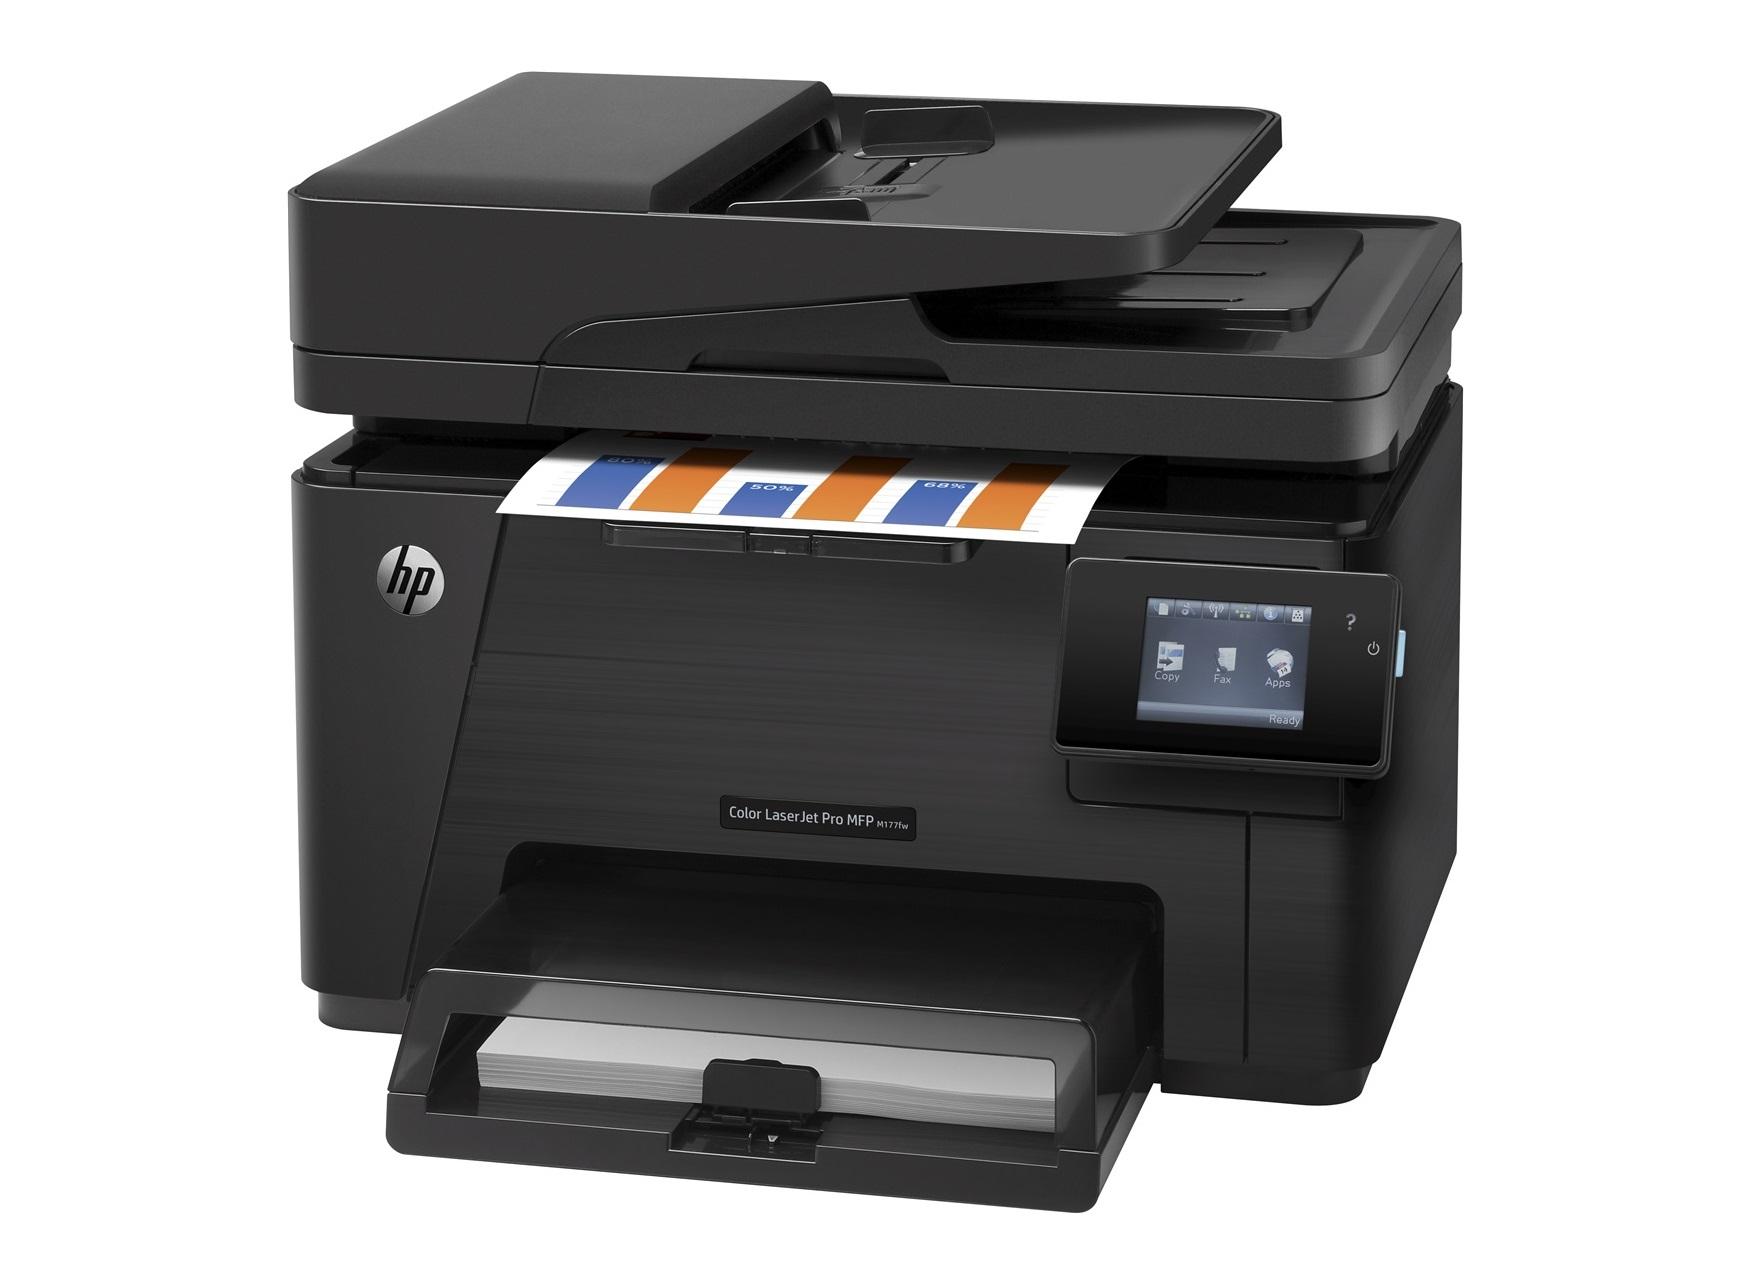 HP Color LaserJet Pro MFP M177fw /A4, 16/4ppm